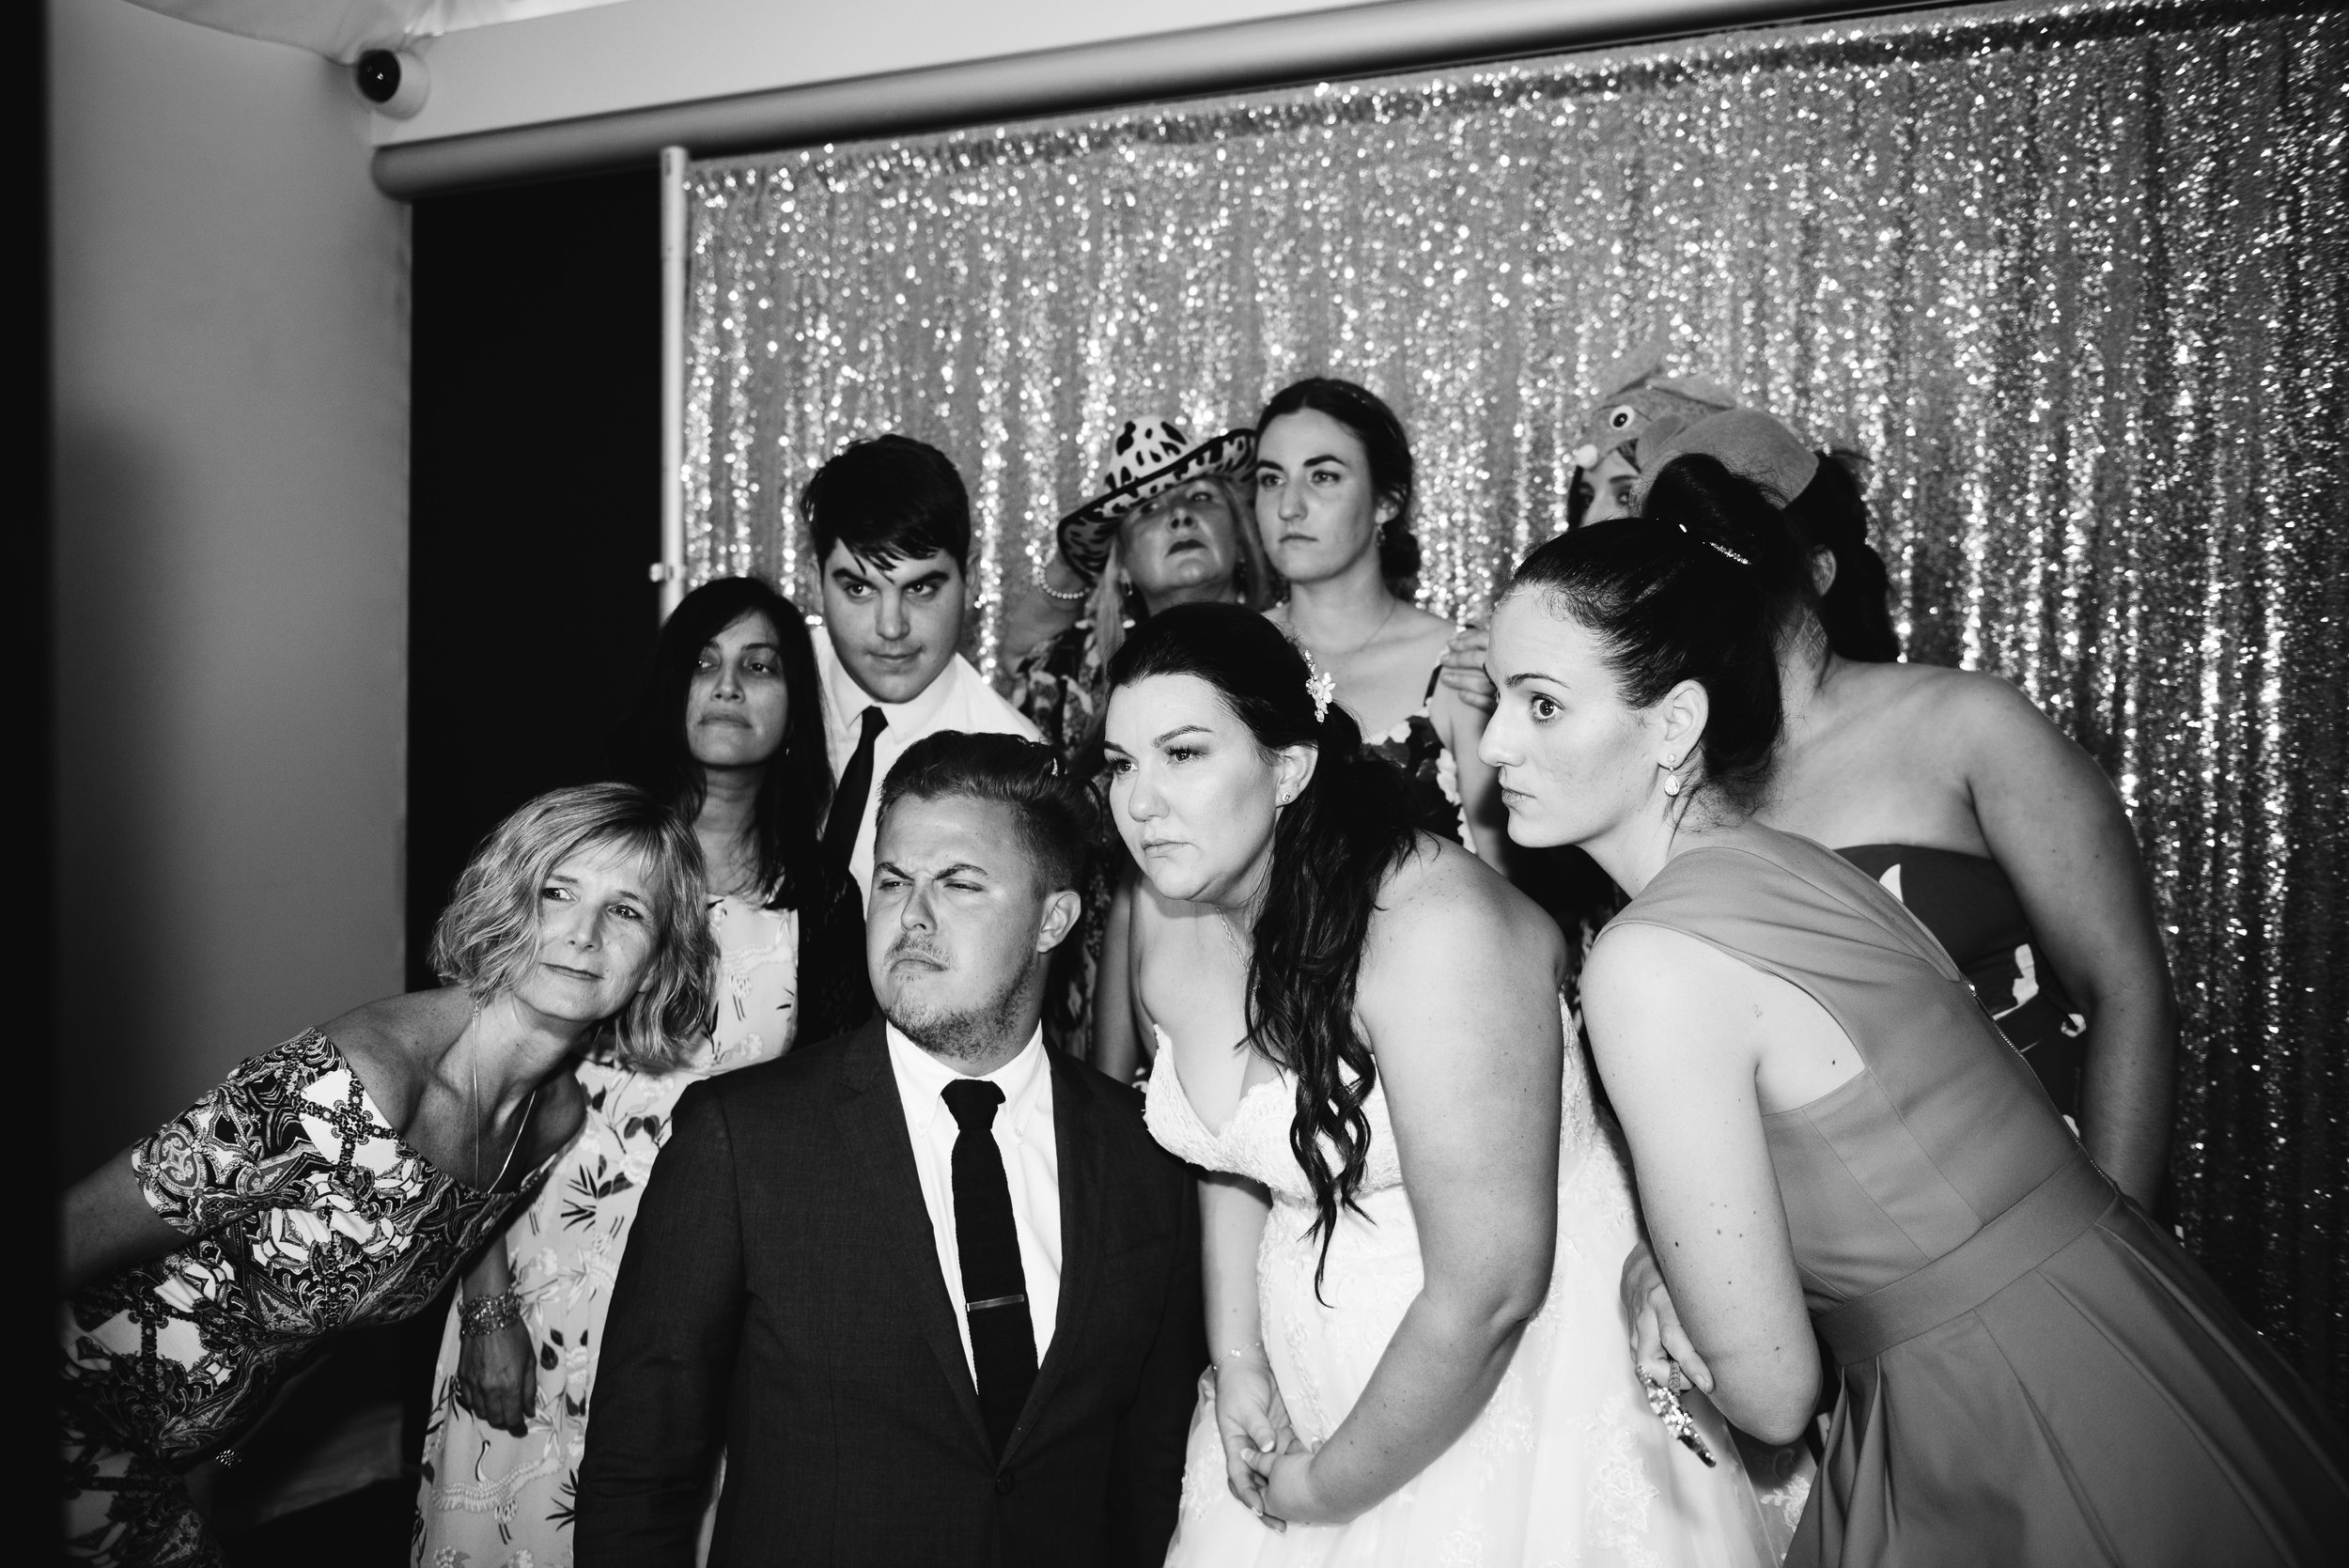 brisbane-wedding-photographer-137.jpg